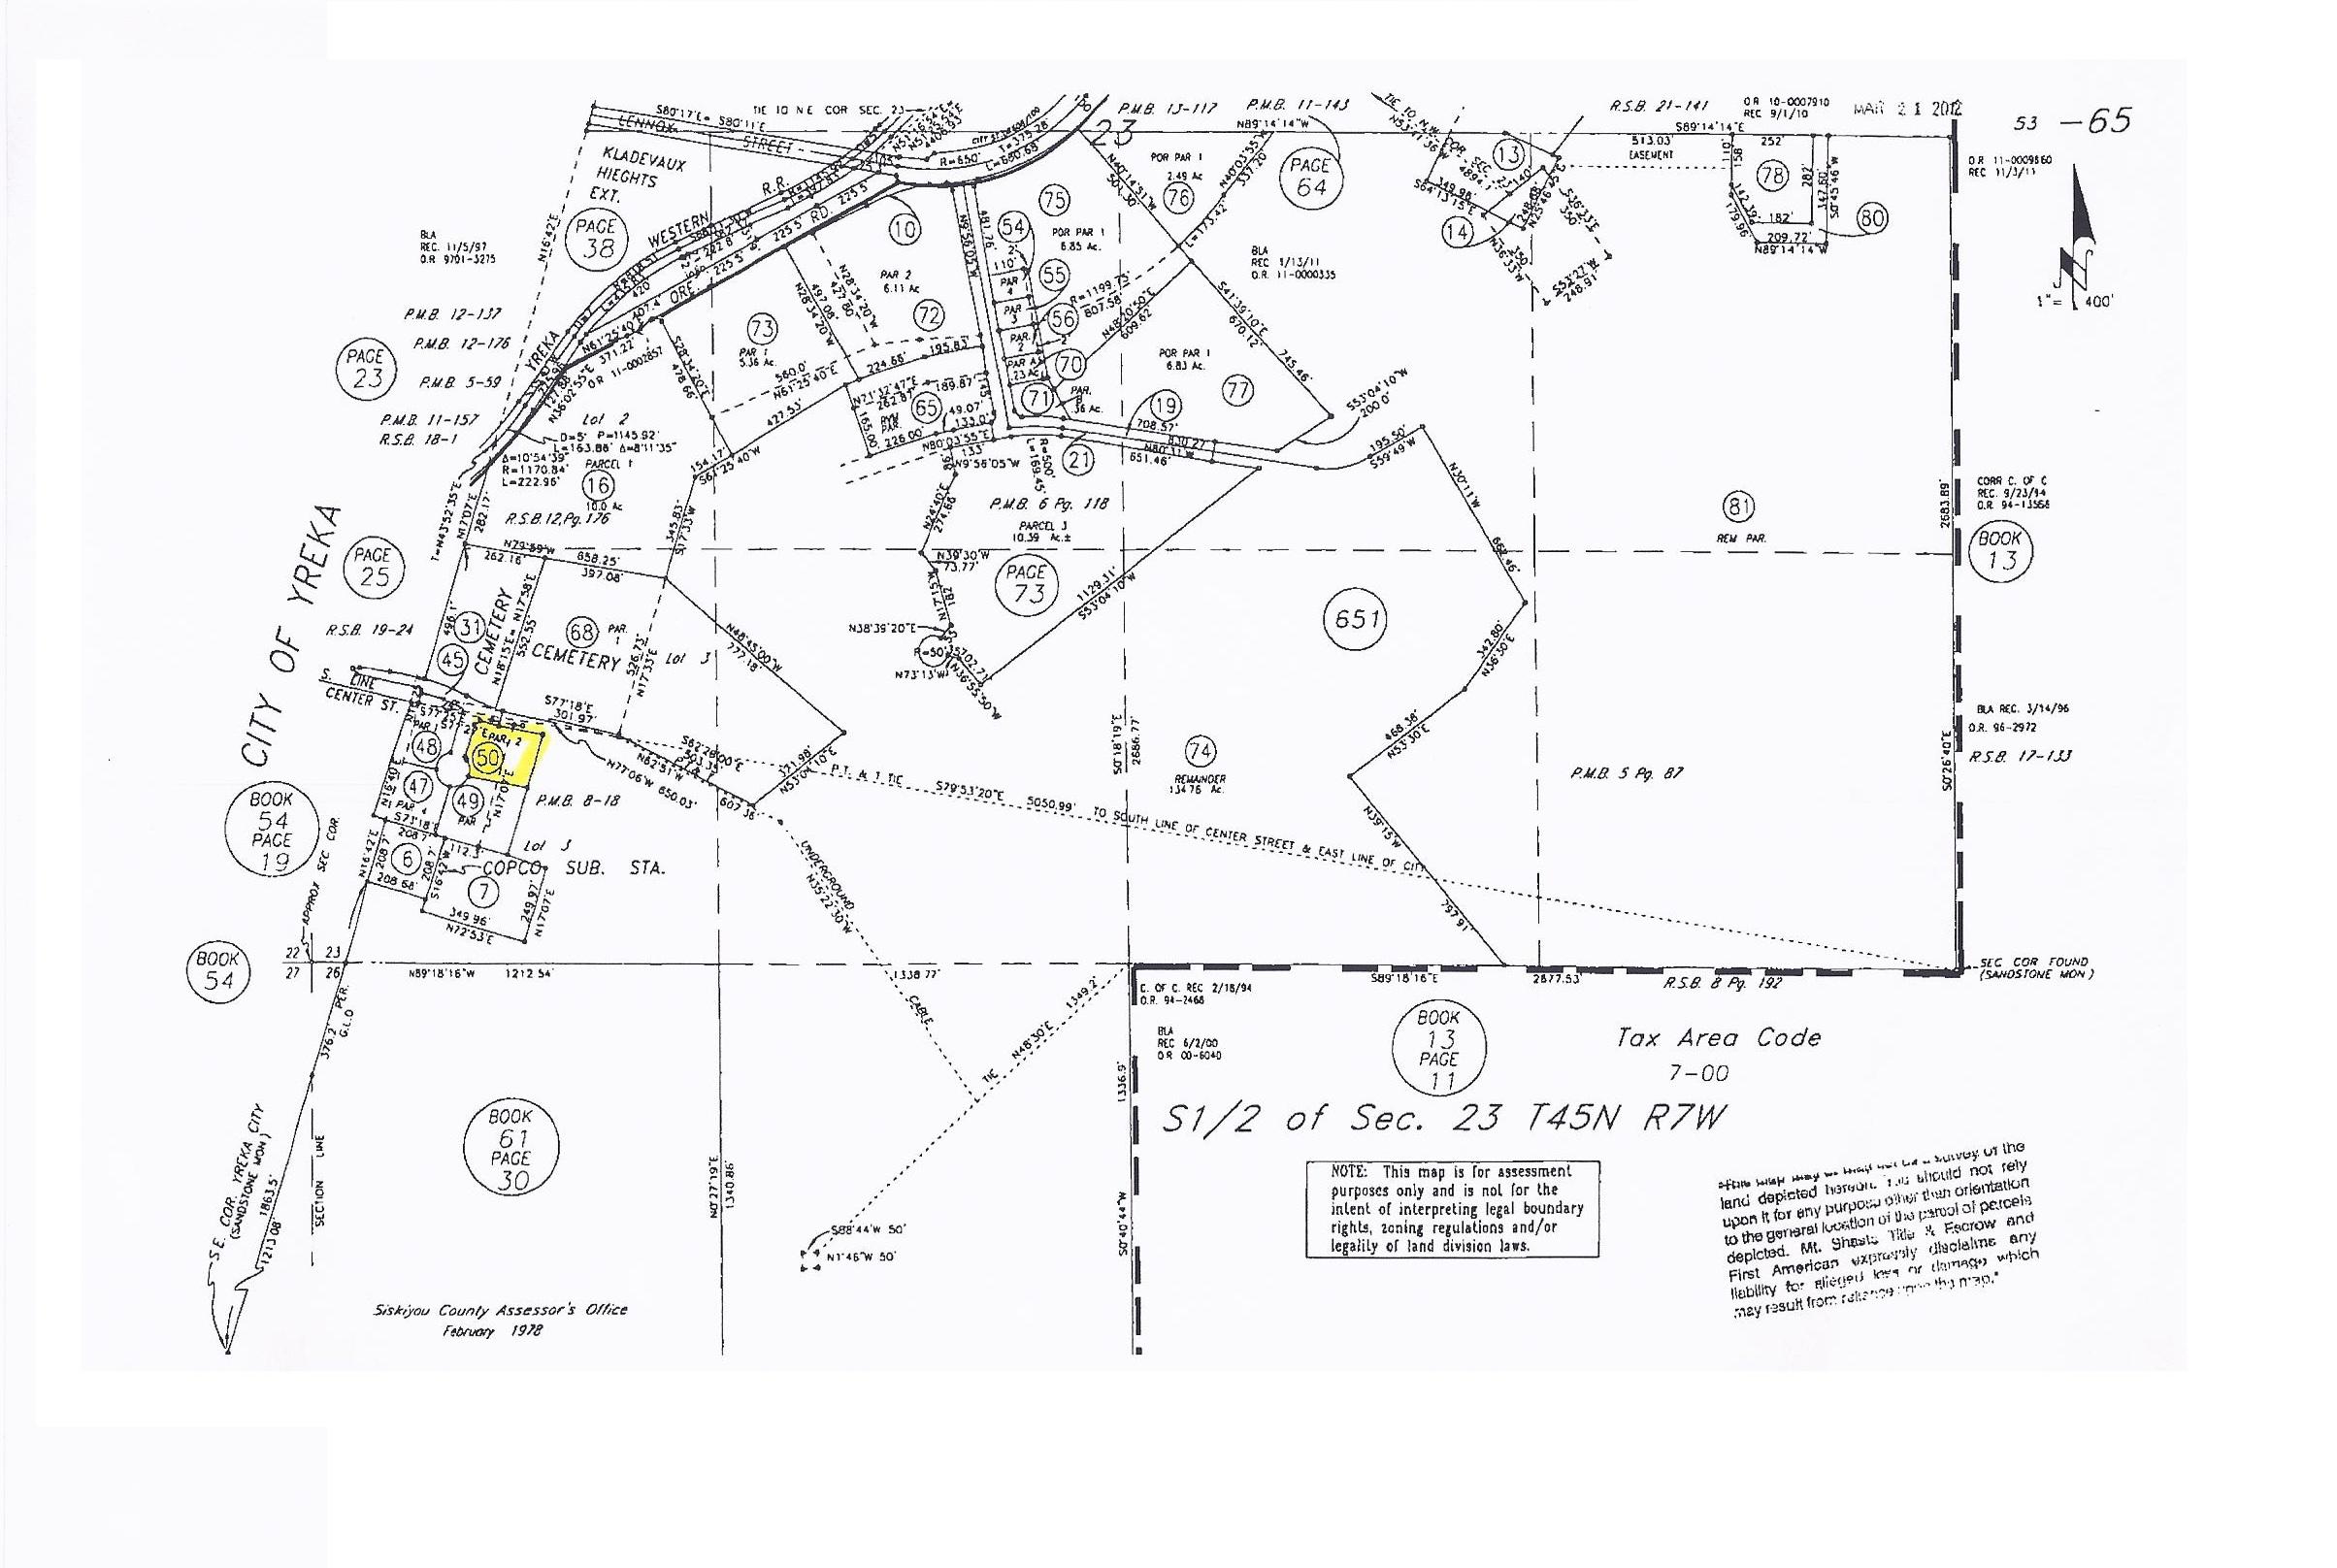 Yreka Comemrcial land for sale Executive-court-yreka-ca